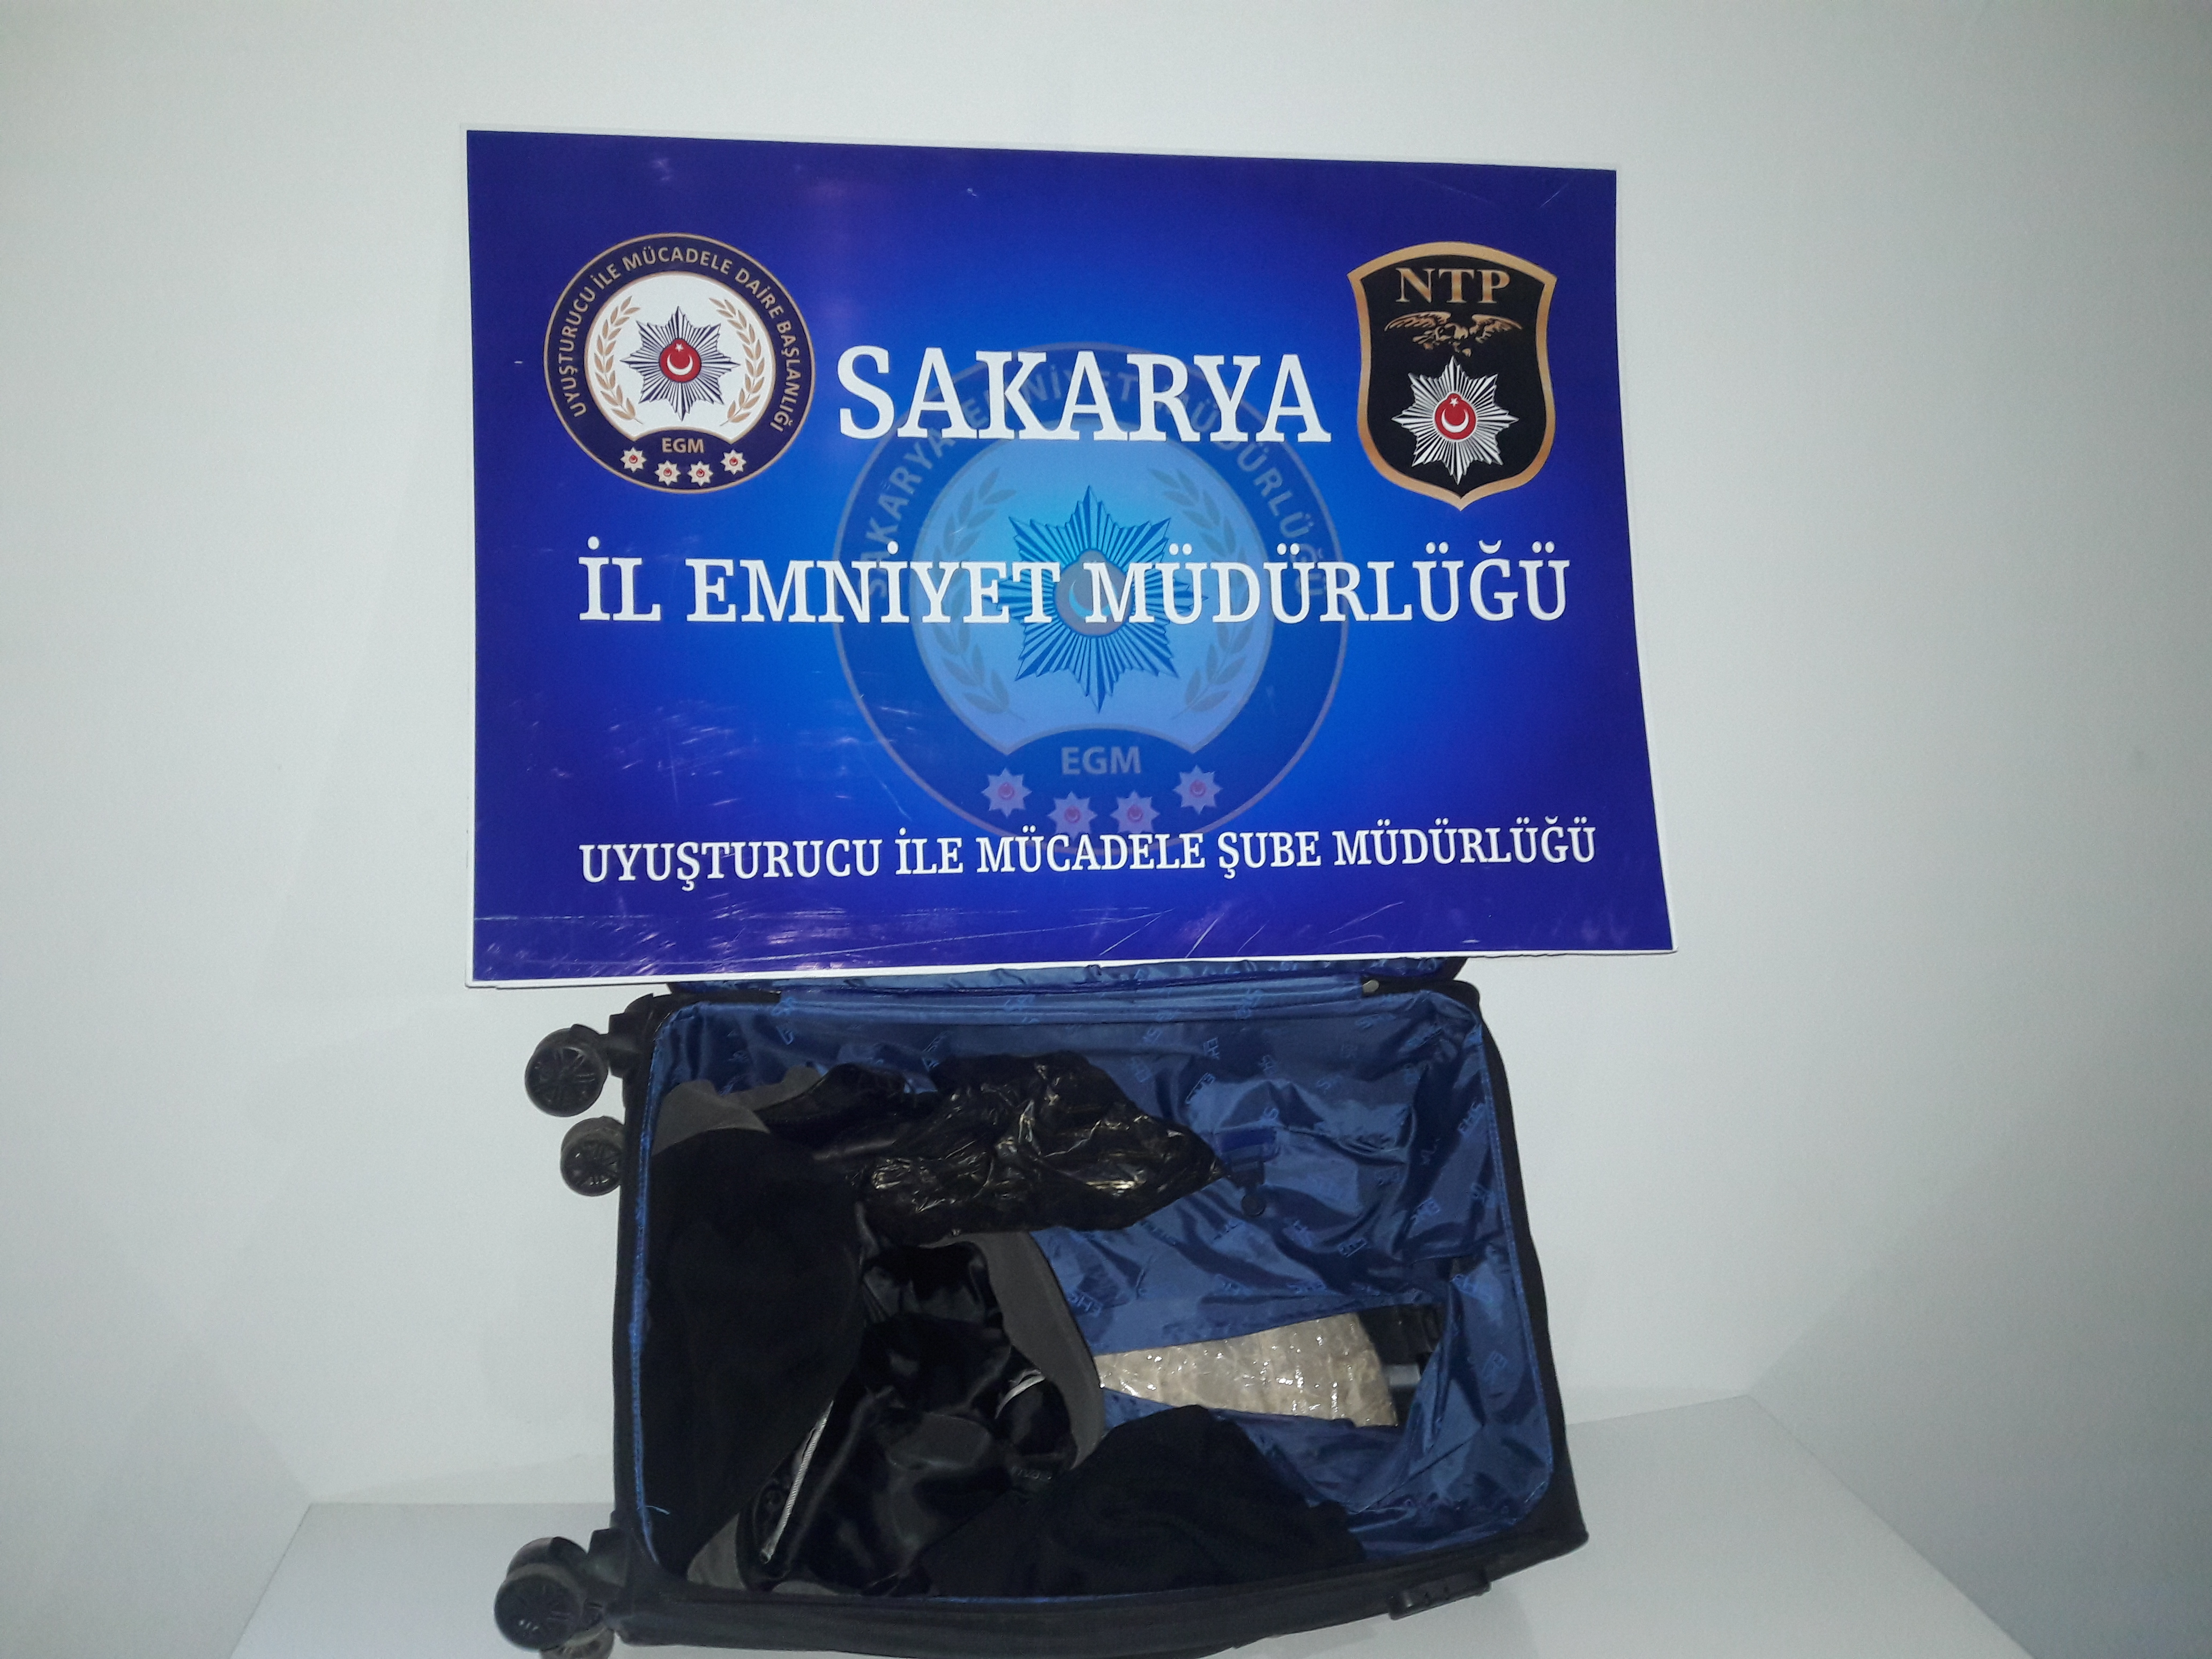 Valizde 3 kilo 540 gram eroin  maddesi ele geçirildi